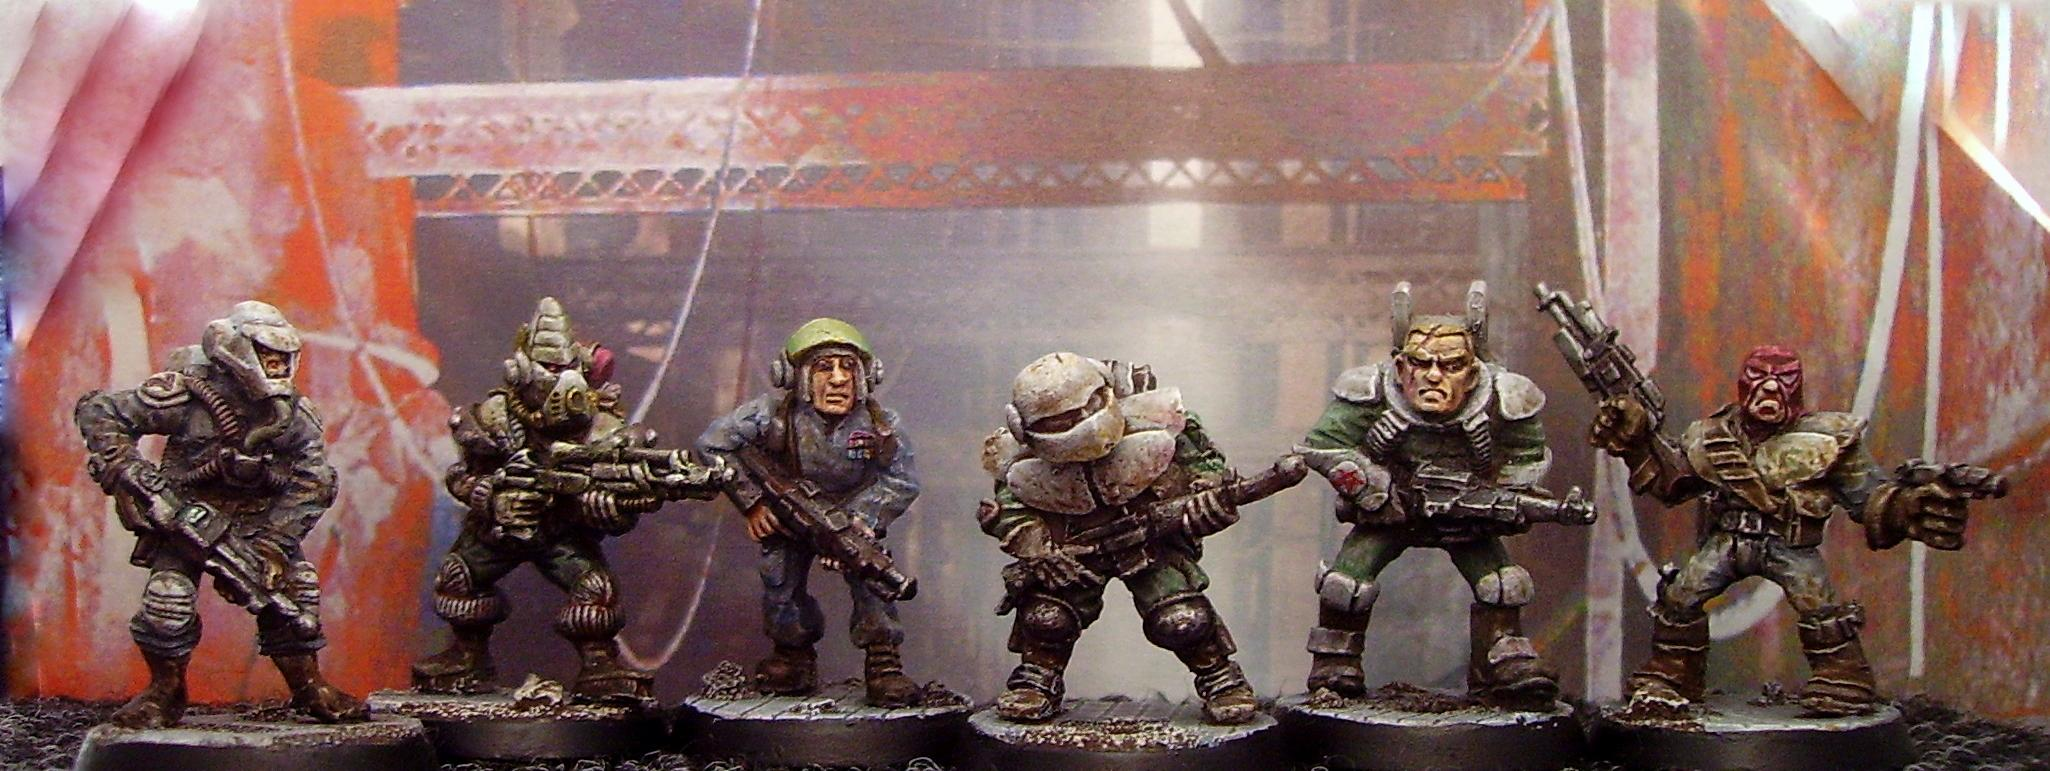 Mercenary, Old-skool, Retro, Warhammer 40,000